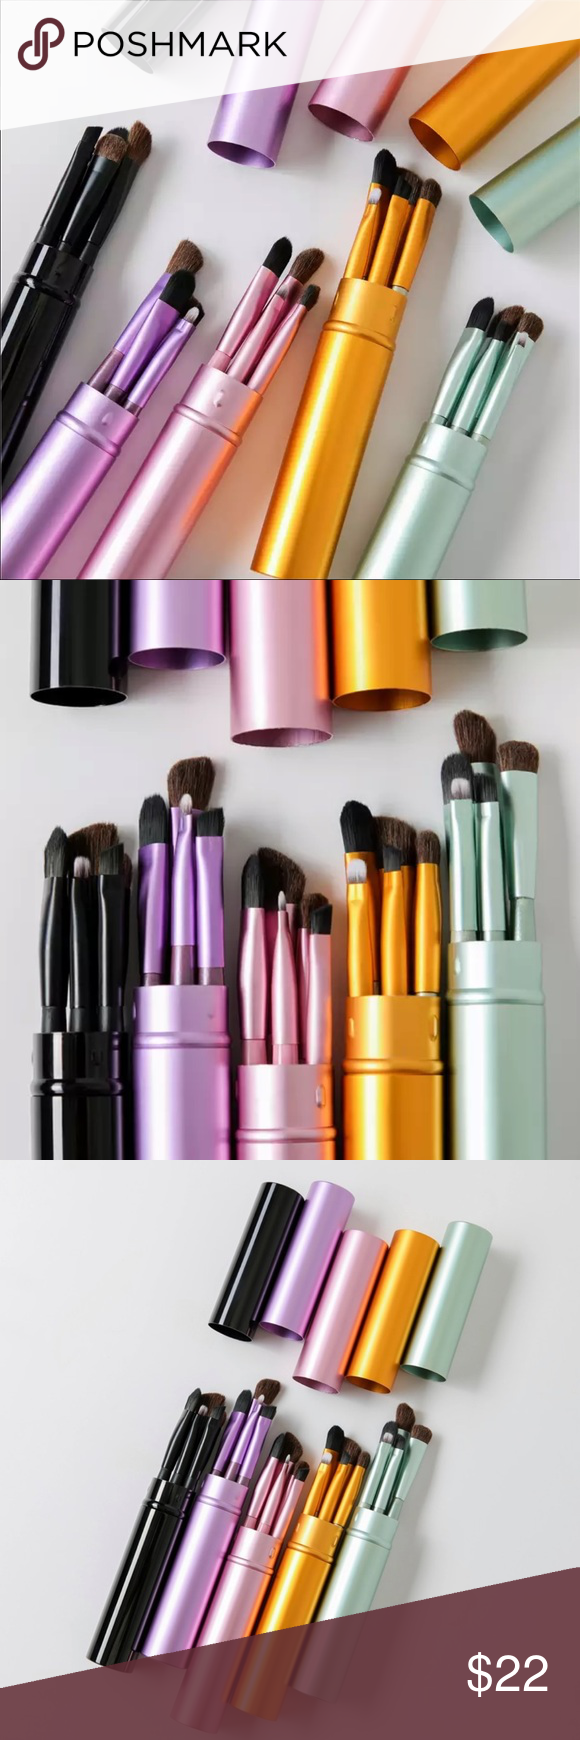 Photo of 5 pcs Makeup Travel Set Professional Make-up Travel Set 5 pcs  Handle Material i…